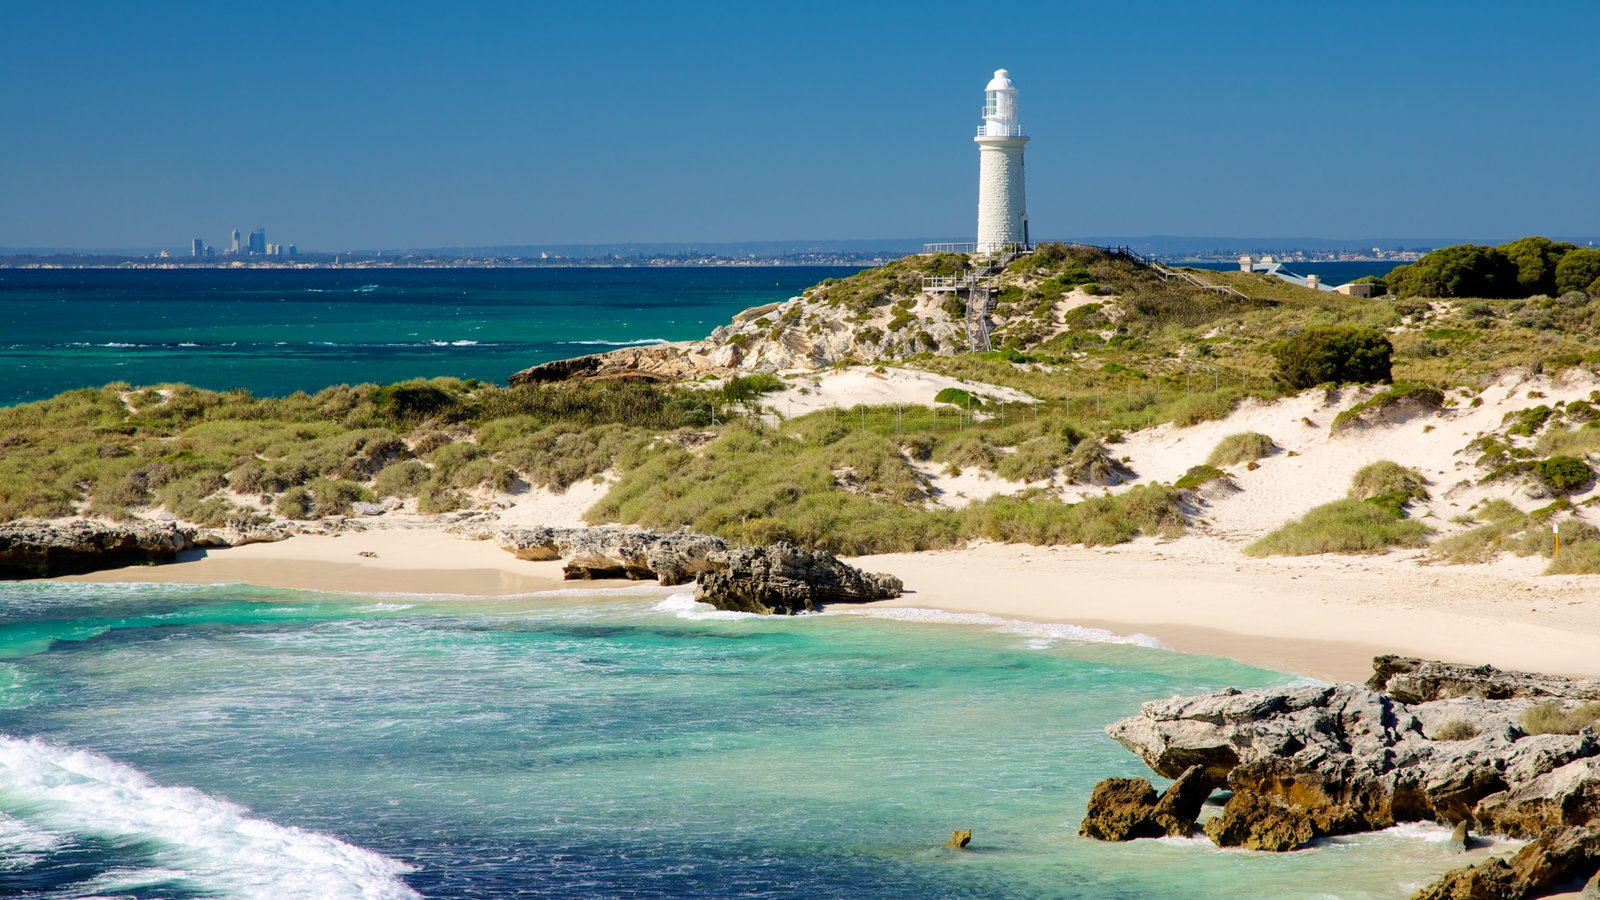 Rottnest Island Australia: Rottnest Island Pictures: View Photos & Images Of Rottnest